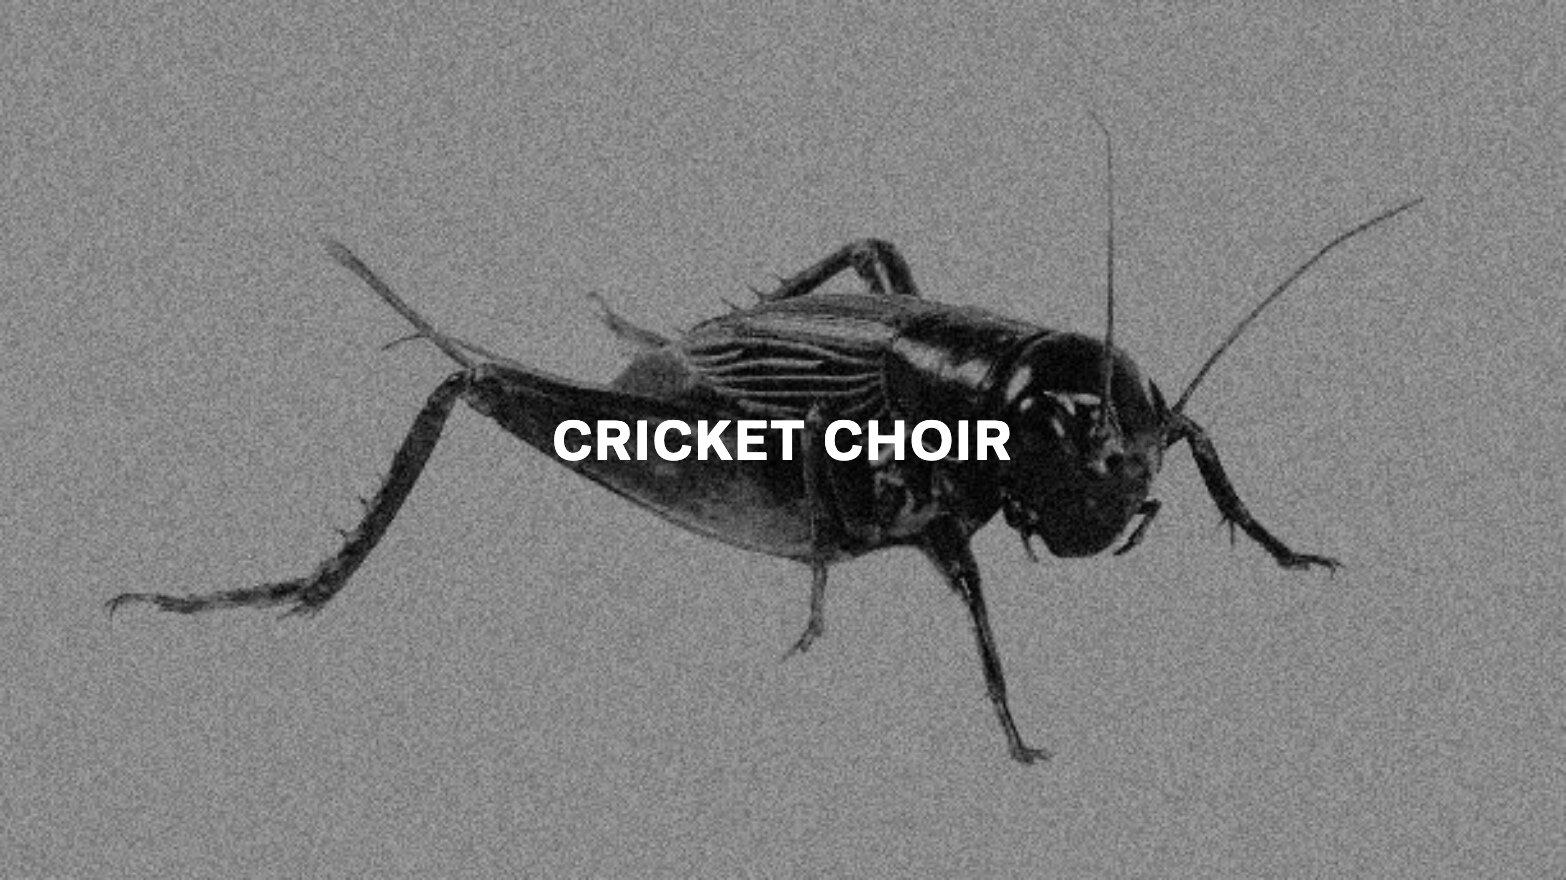 Cricket Choir Text.jpg